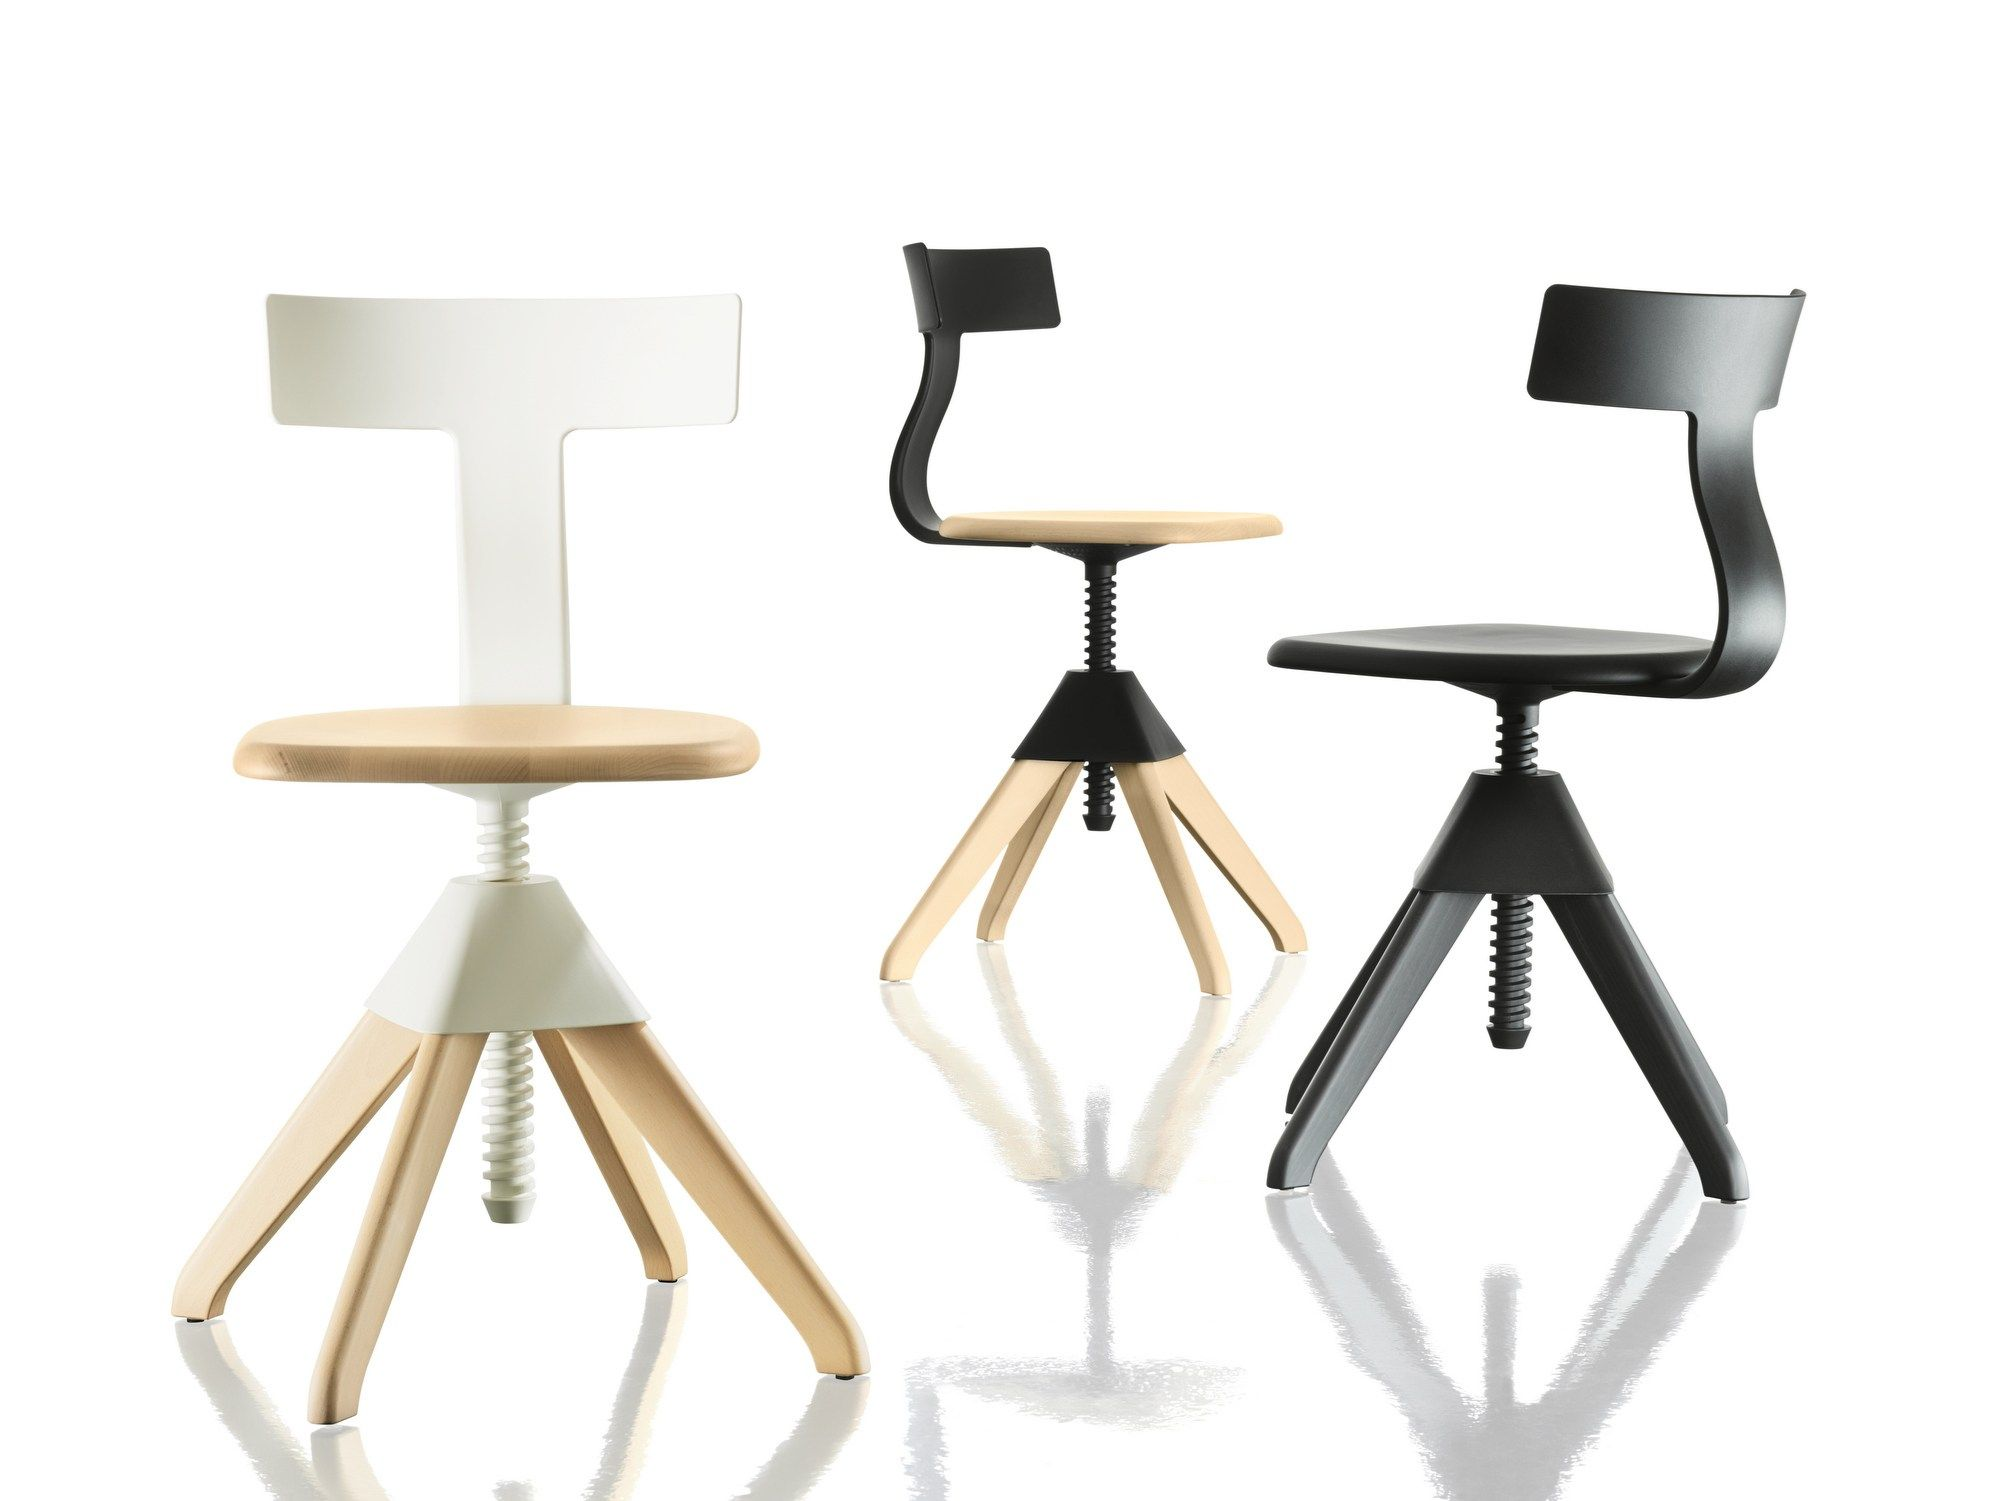 Sedia ad altezza regolabile TUFFY – THE WILD BUNCH by Magis design Konstantin Grcic